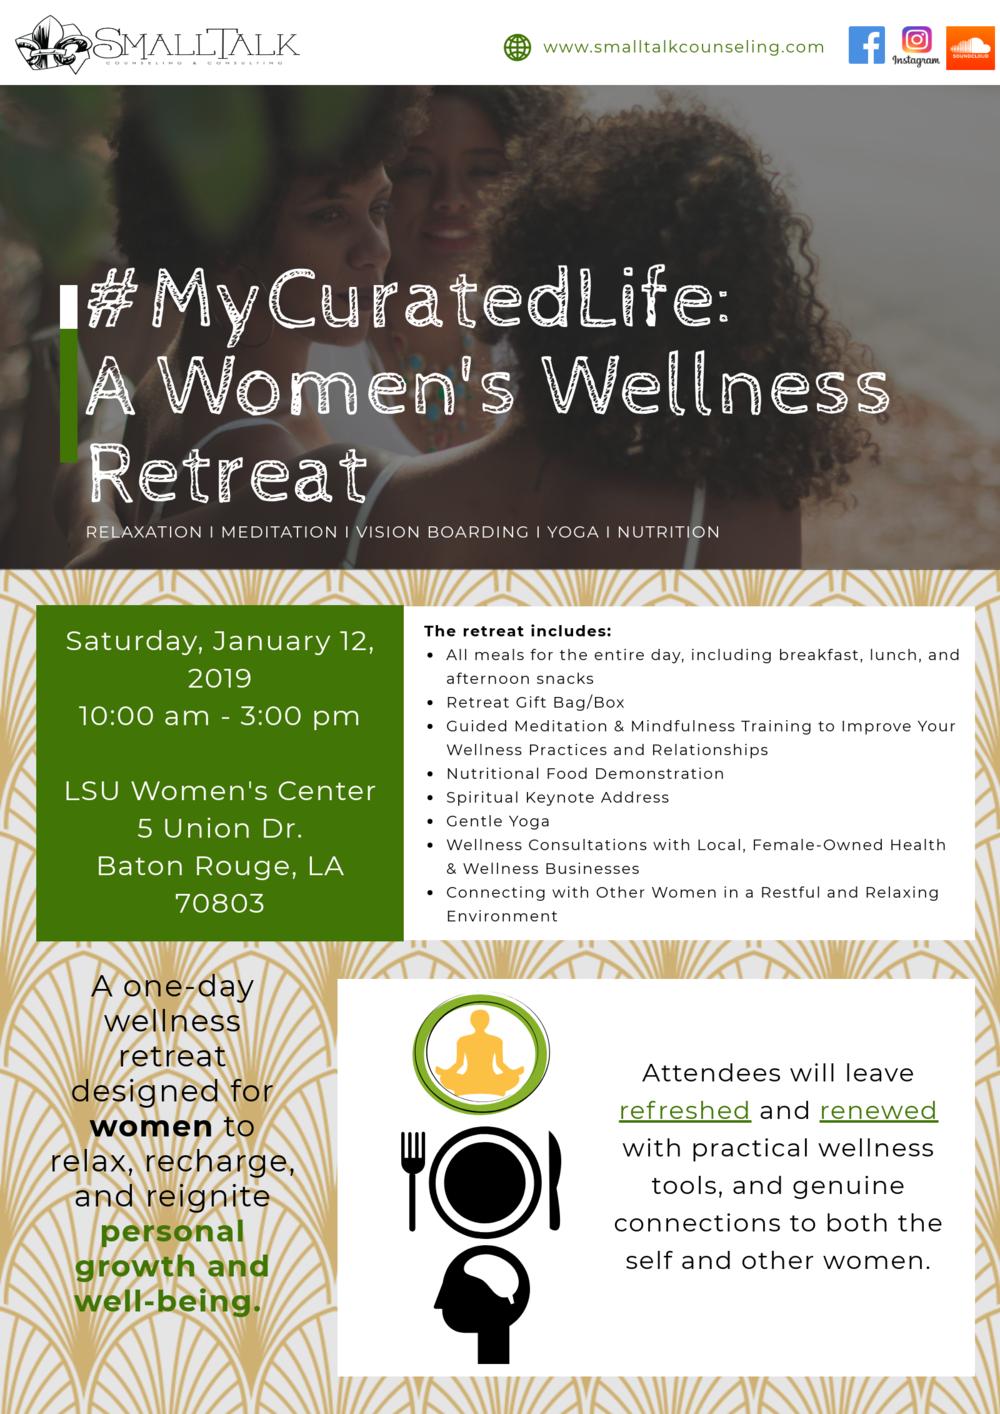 www.mycuratedliferetreat.eventbrite.com